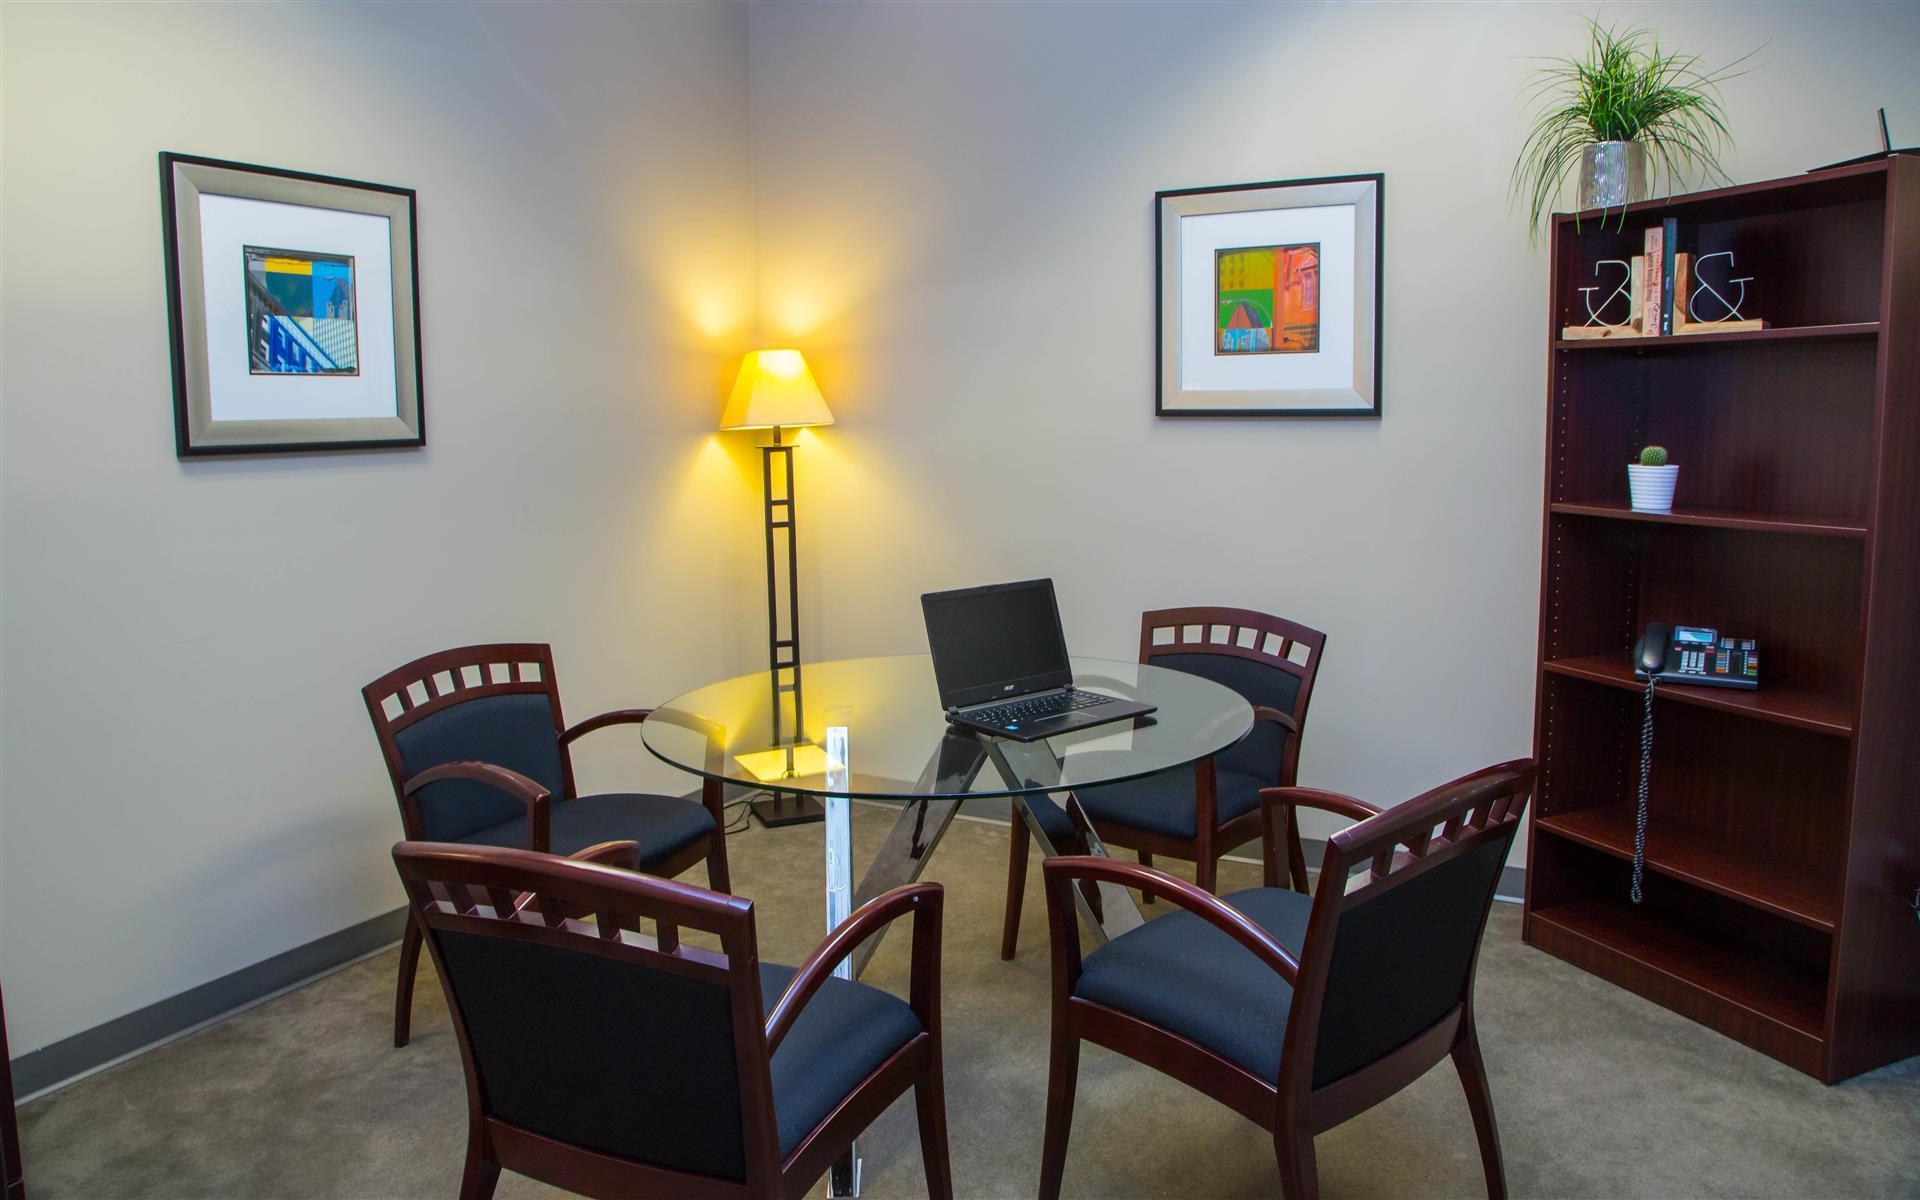 Top 10 meeting rooms